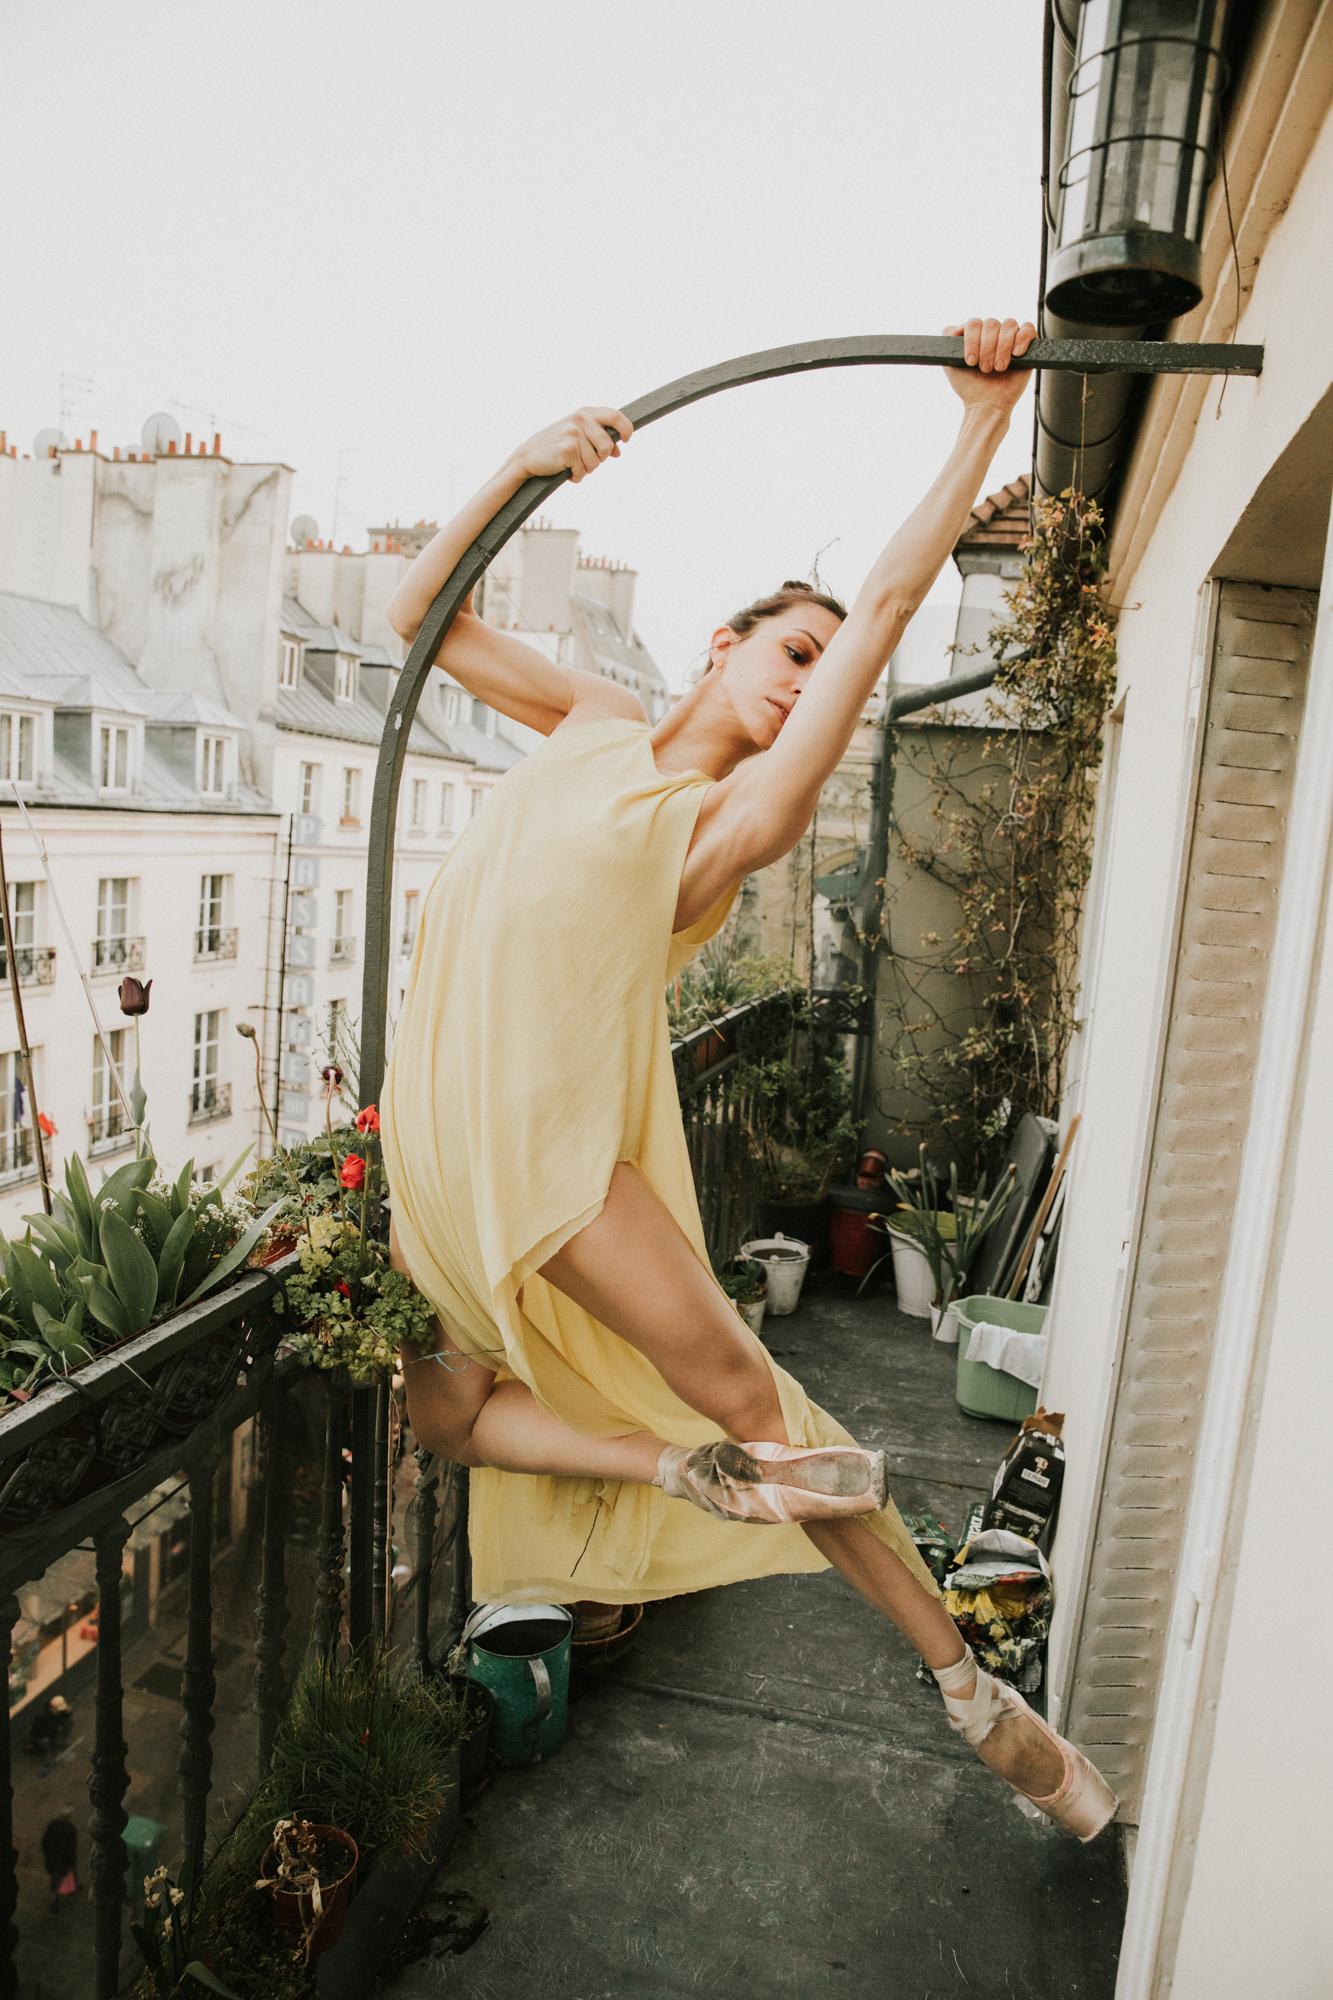 pas_de_bourré_PhotoChristianMamoun_Dancer_liakemendi_styling_IngridShirineHobaya_HairMakeup_JosephineBrignonAssistance_TanjaBieri_retouche_AudyMarchand018.jpg